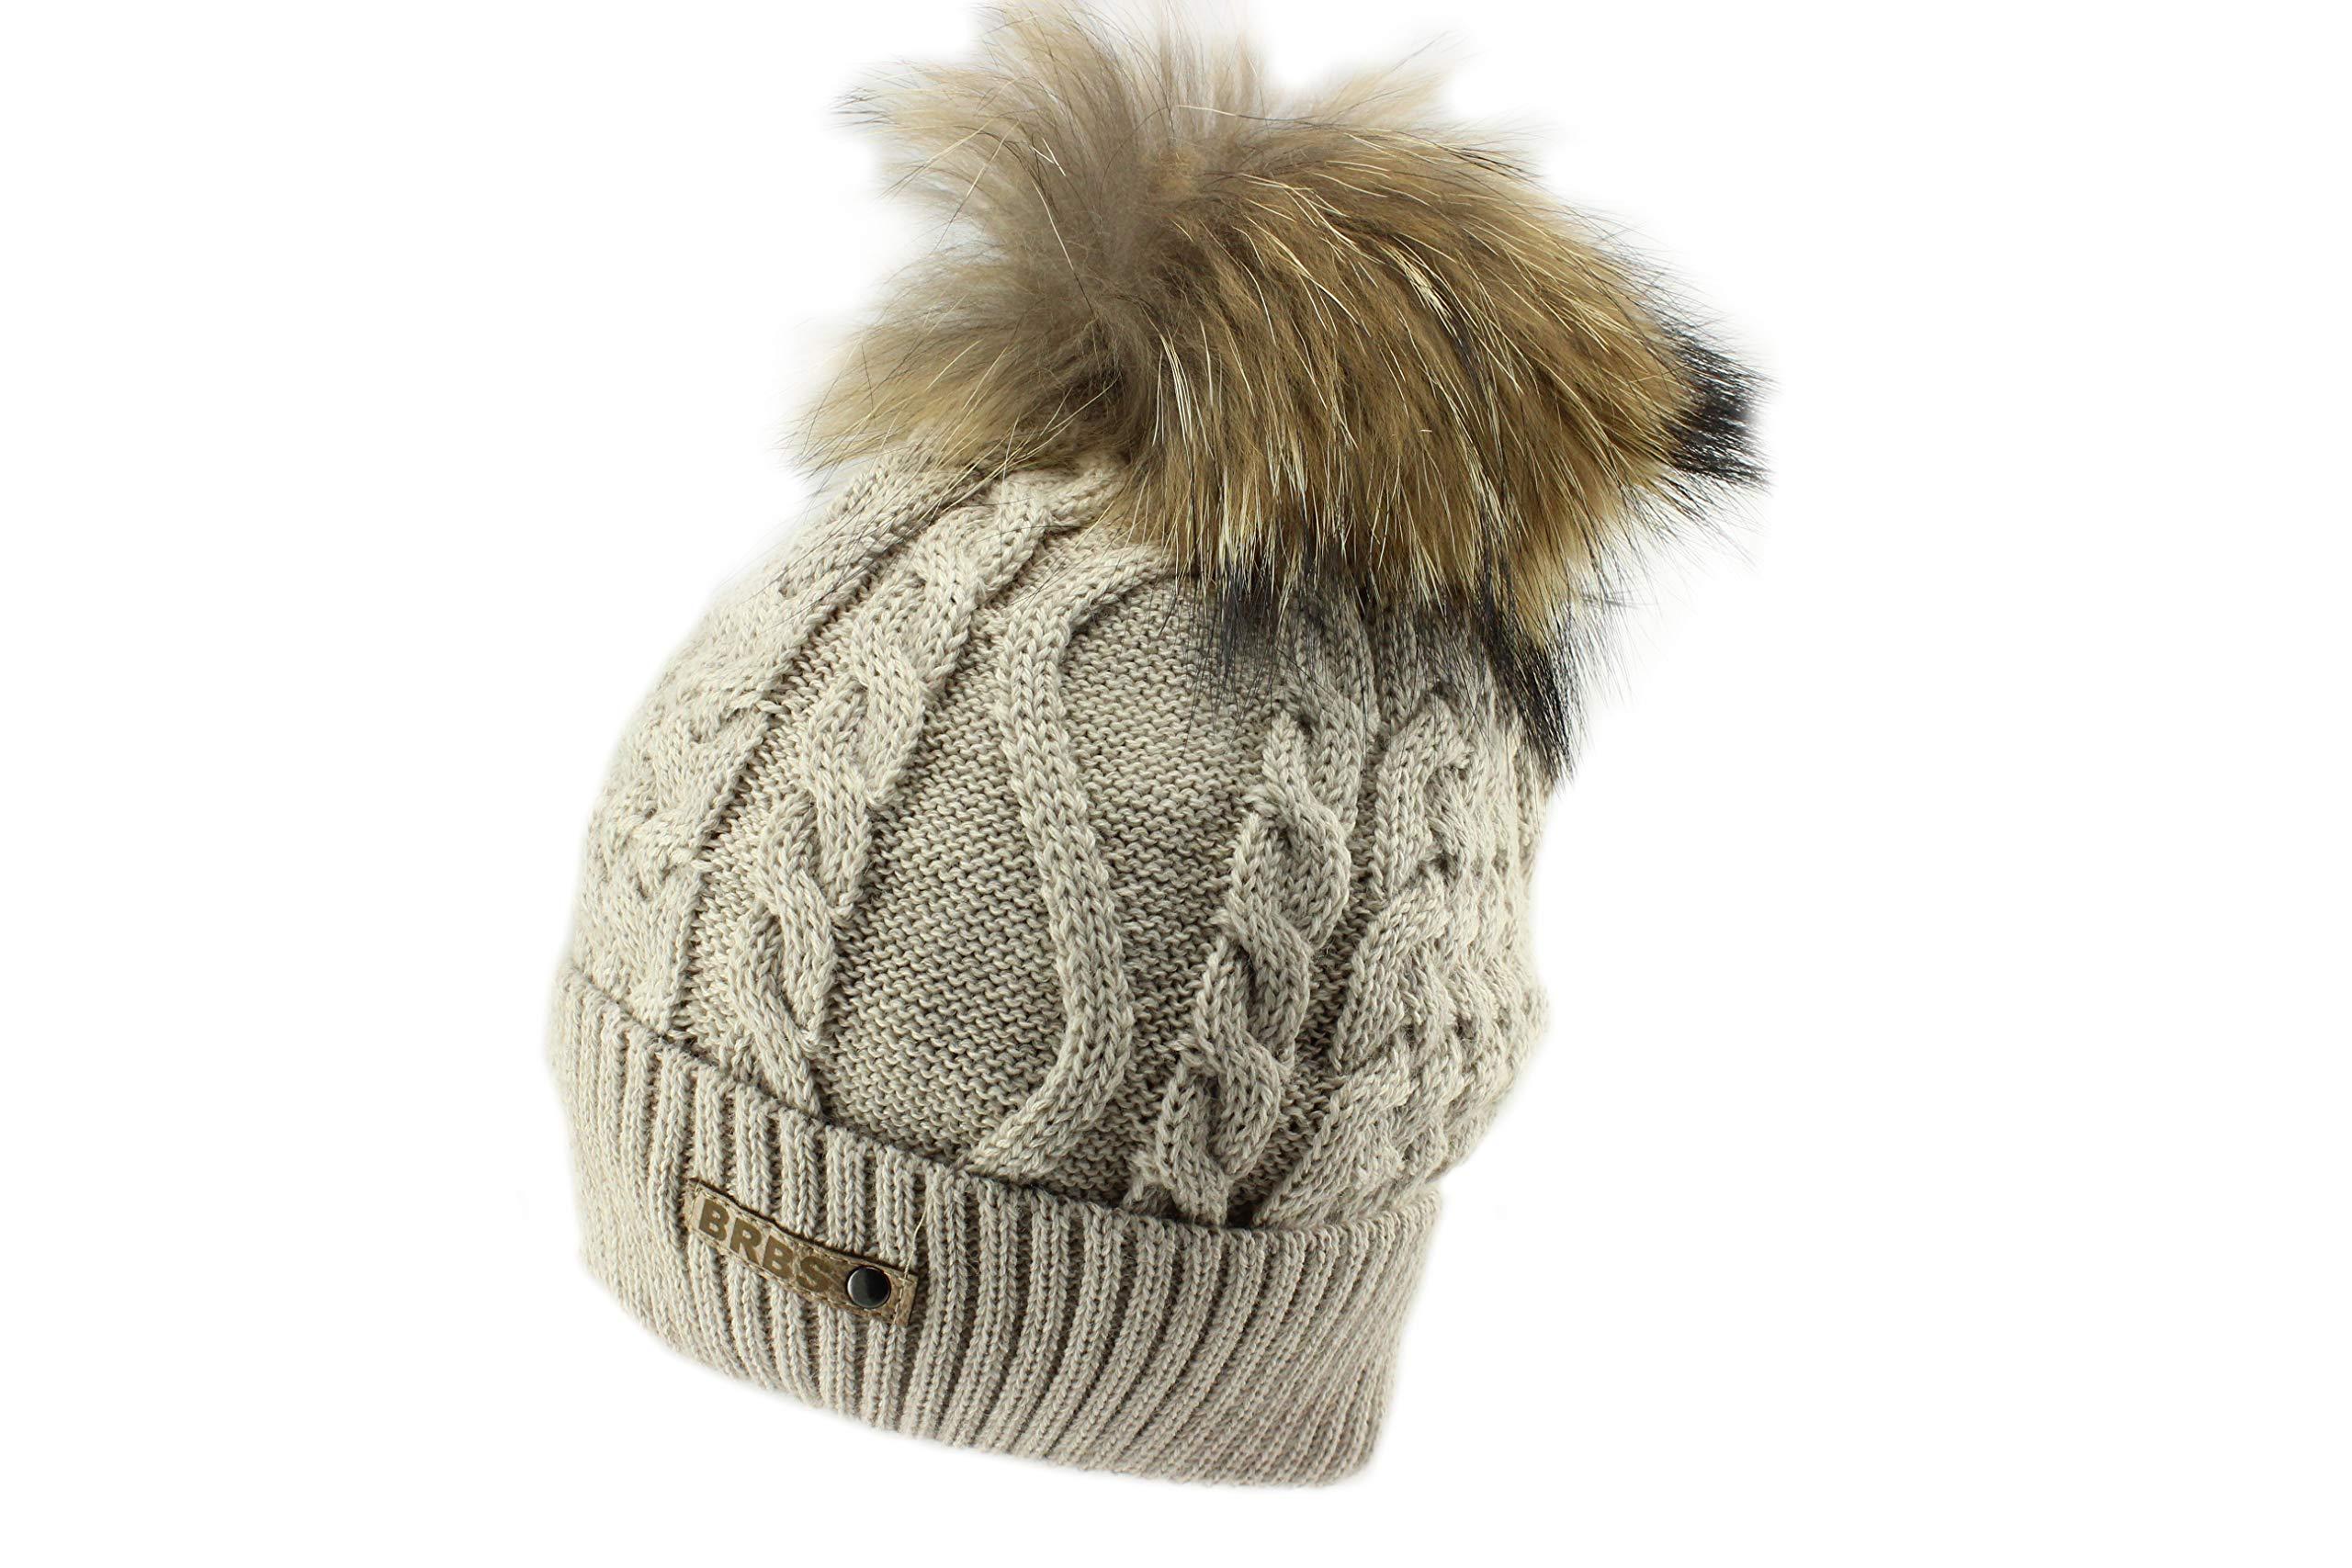 Barbaras Brown Warm Winter Natural Fur Pom Pom Beanie Hat